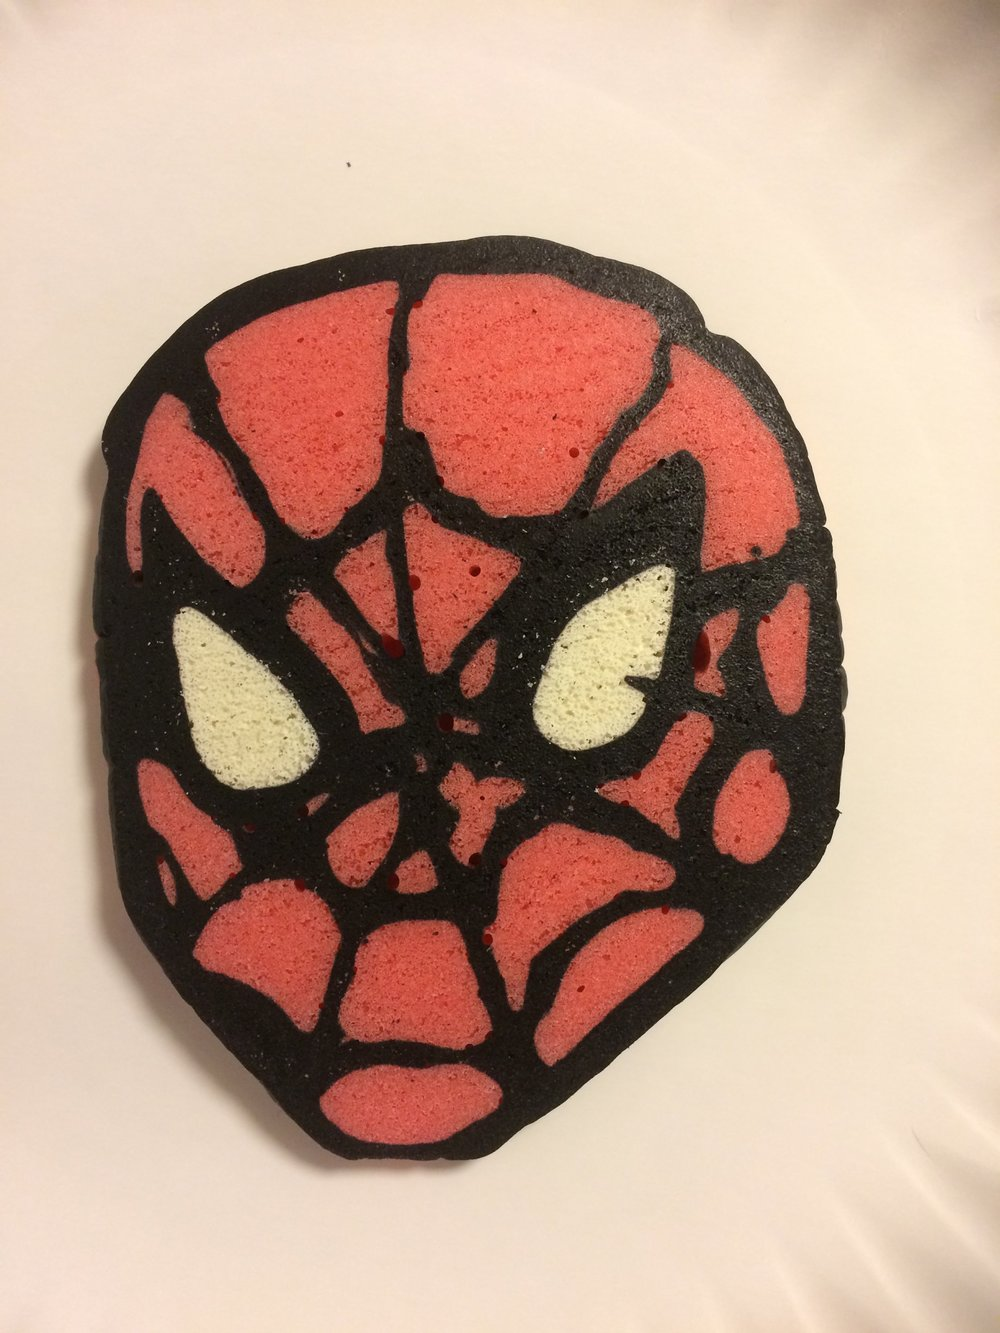 JennyPancake_Spiderman.JPG